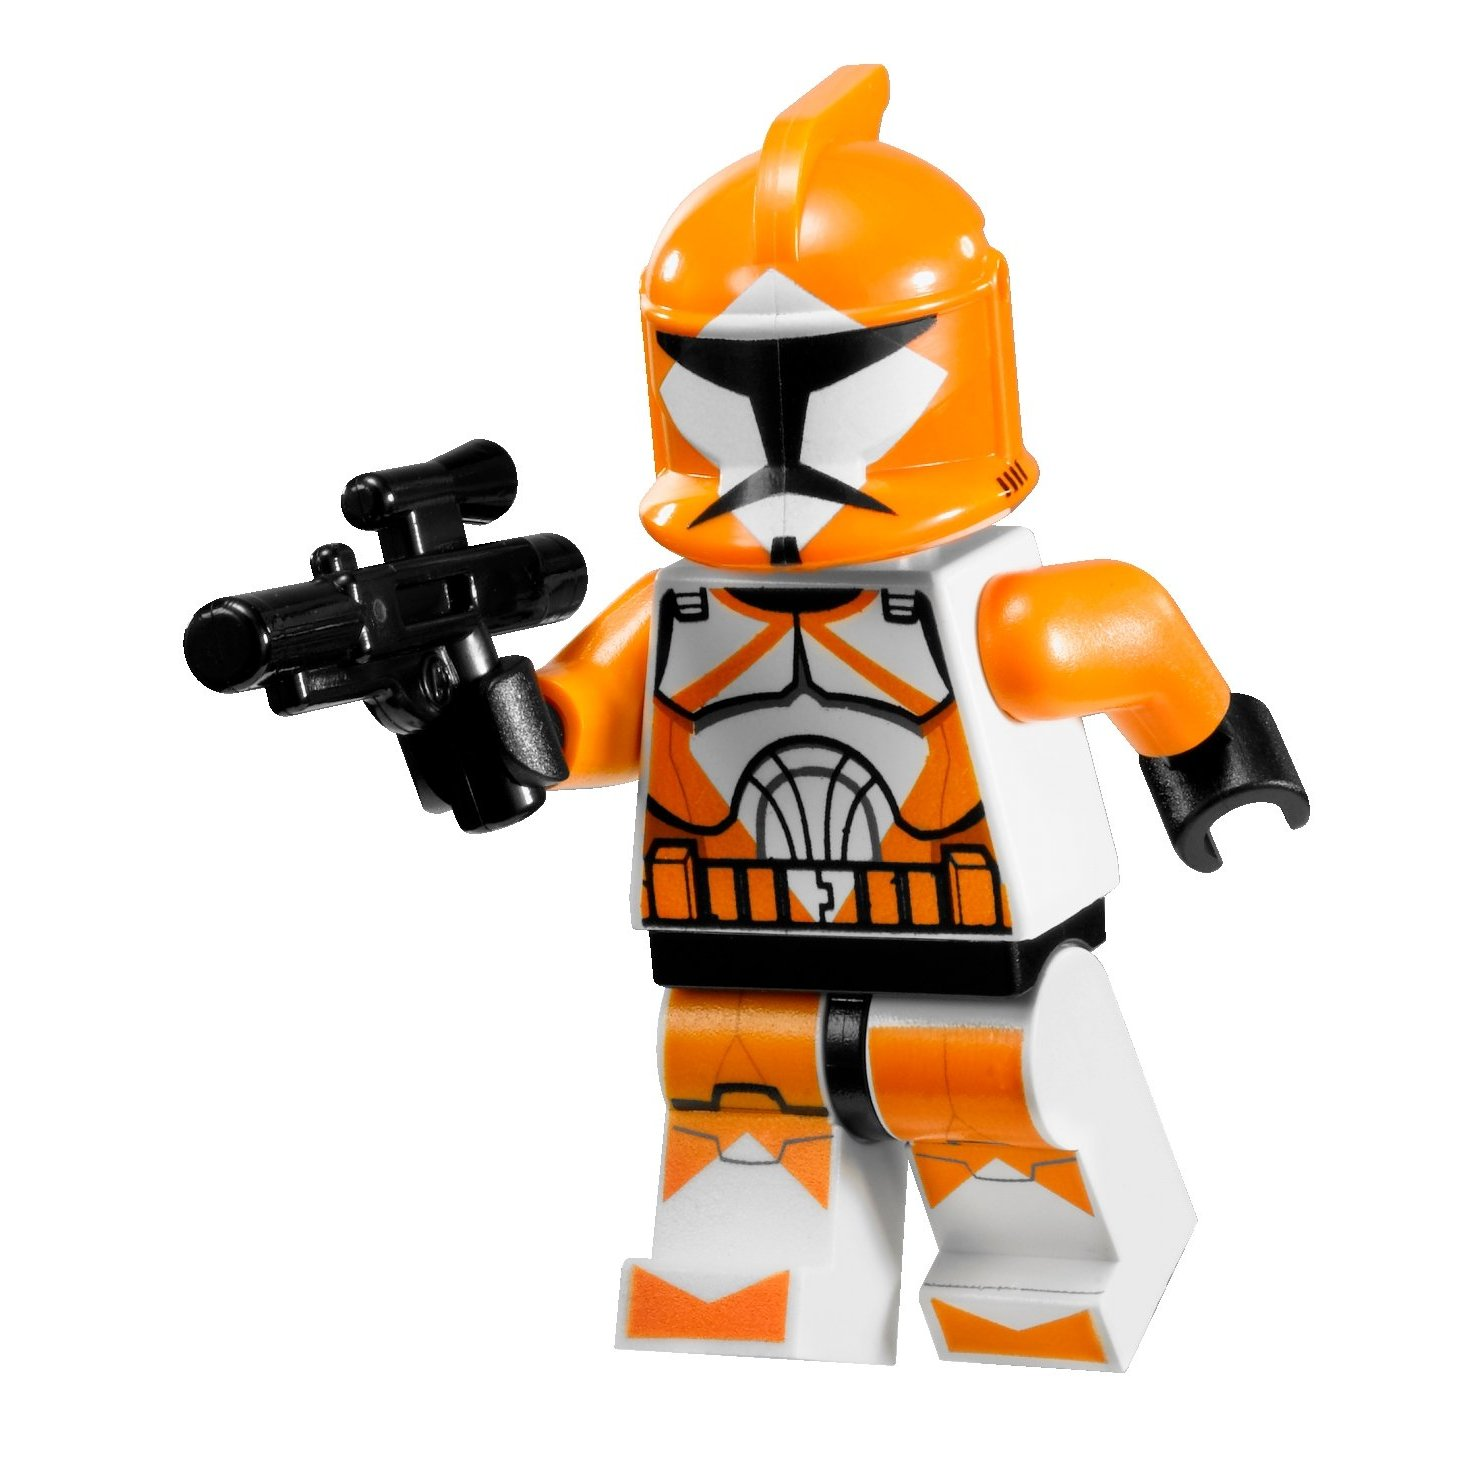 1469x1469 Star Wars Lego Mini Figures Clipart